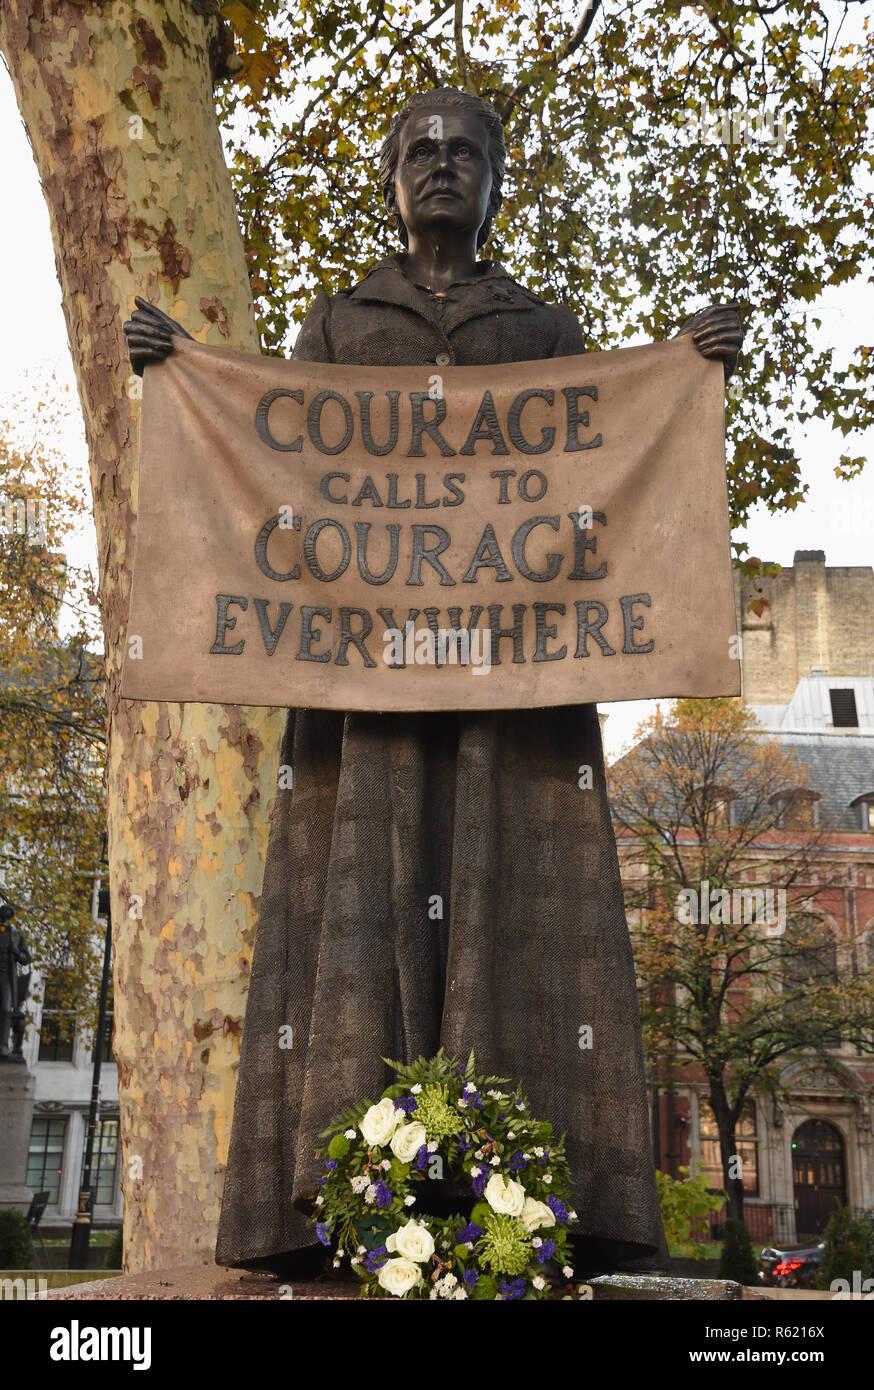 Millicent Fawcett,Suffragette Stature,Parliament Square,London.UK - Stock Image